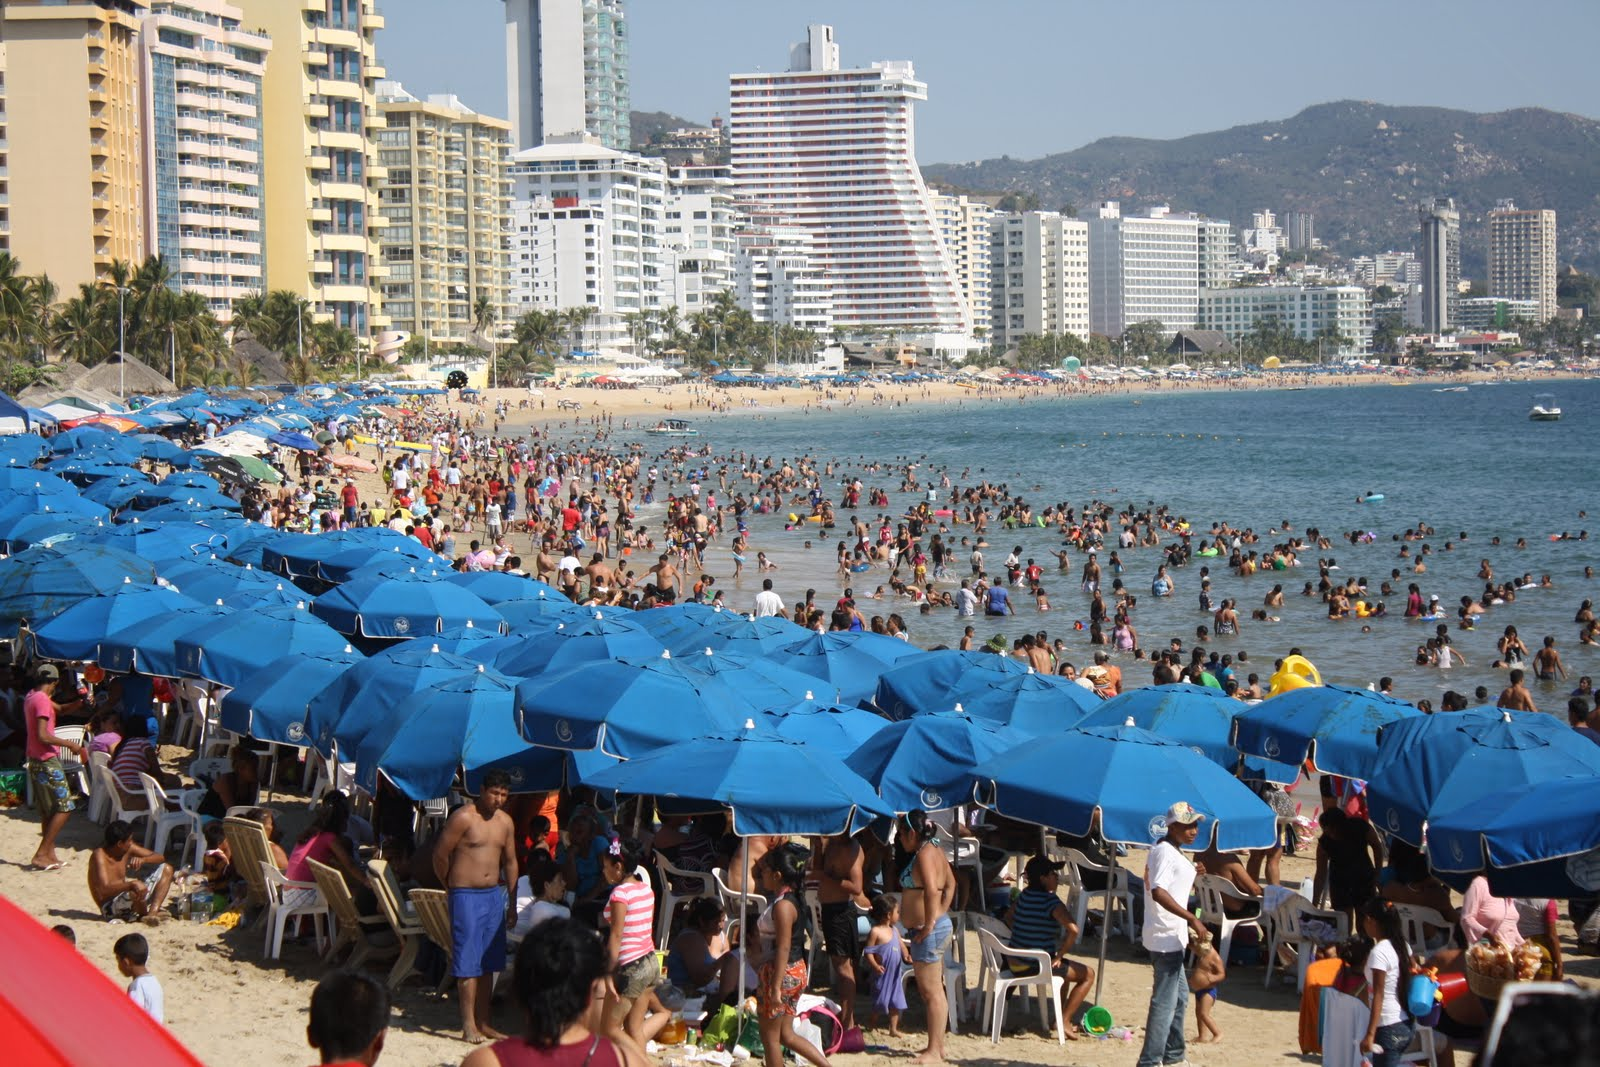 acapulco-limite-ocupacion-hotelera